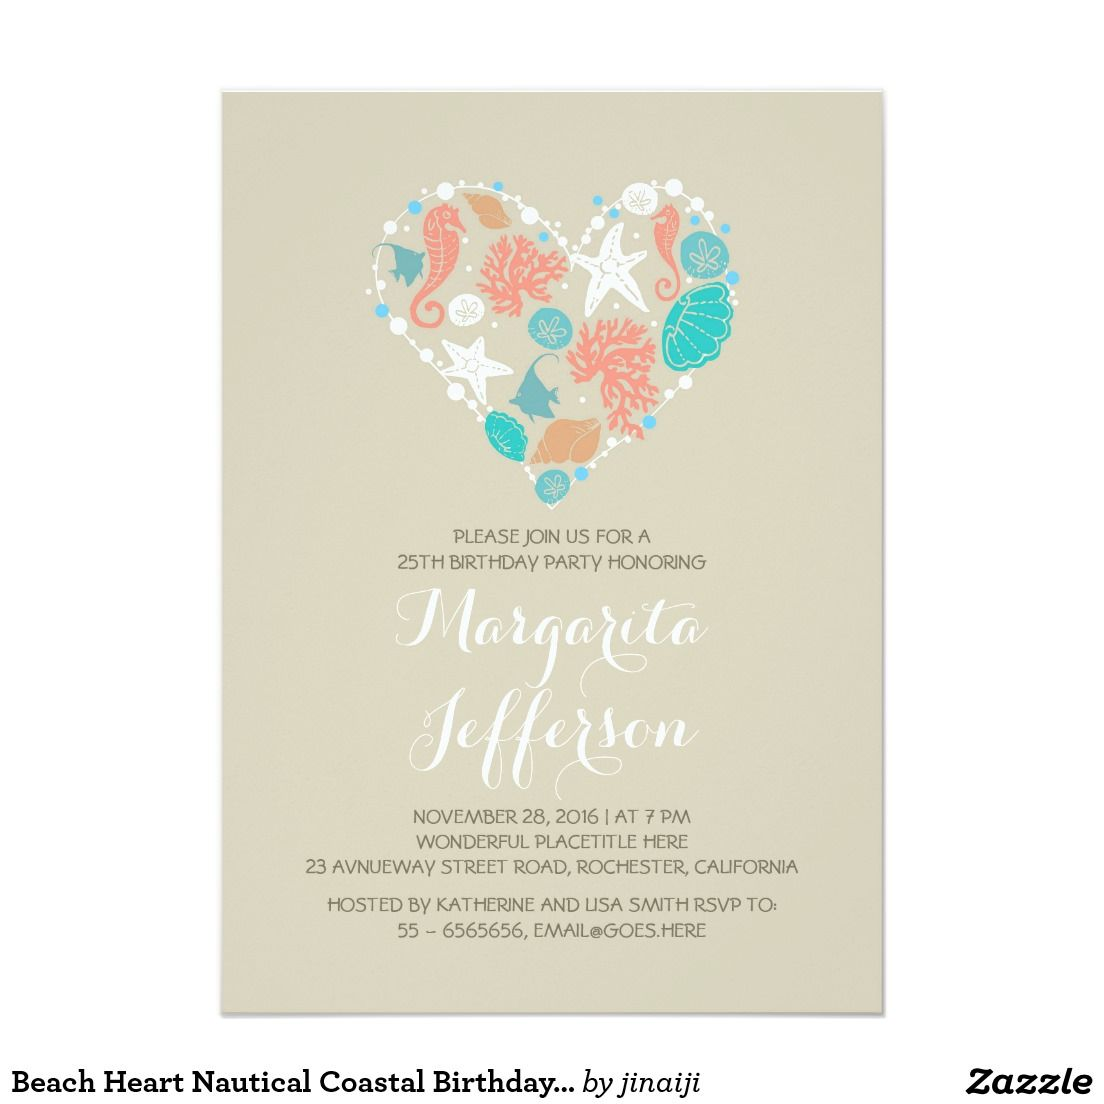 Beach Heart Nautical Coastal Birthday Party Card Beautiful ocean treasures beach heart birthday party invitation with white pearls, coral, starfish, sand dollars, seahorses and seashells